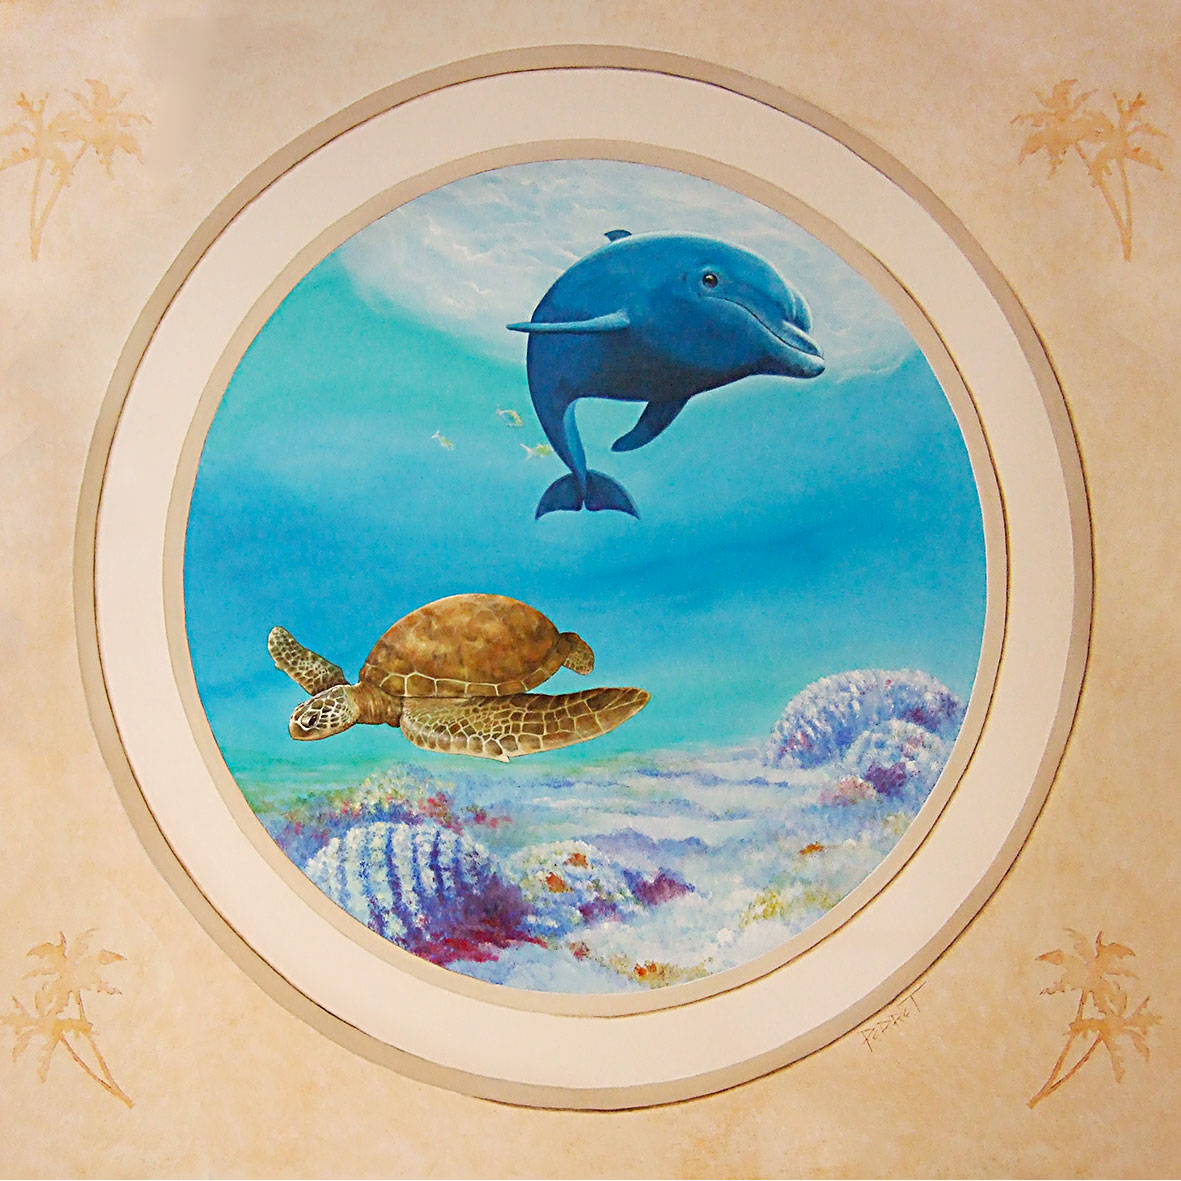 Trompe-l'œil dans un institut de beauté- Un Air Marin à Obernai. Fresque de Roland Perret. illusions-murales.com